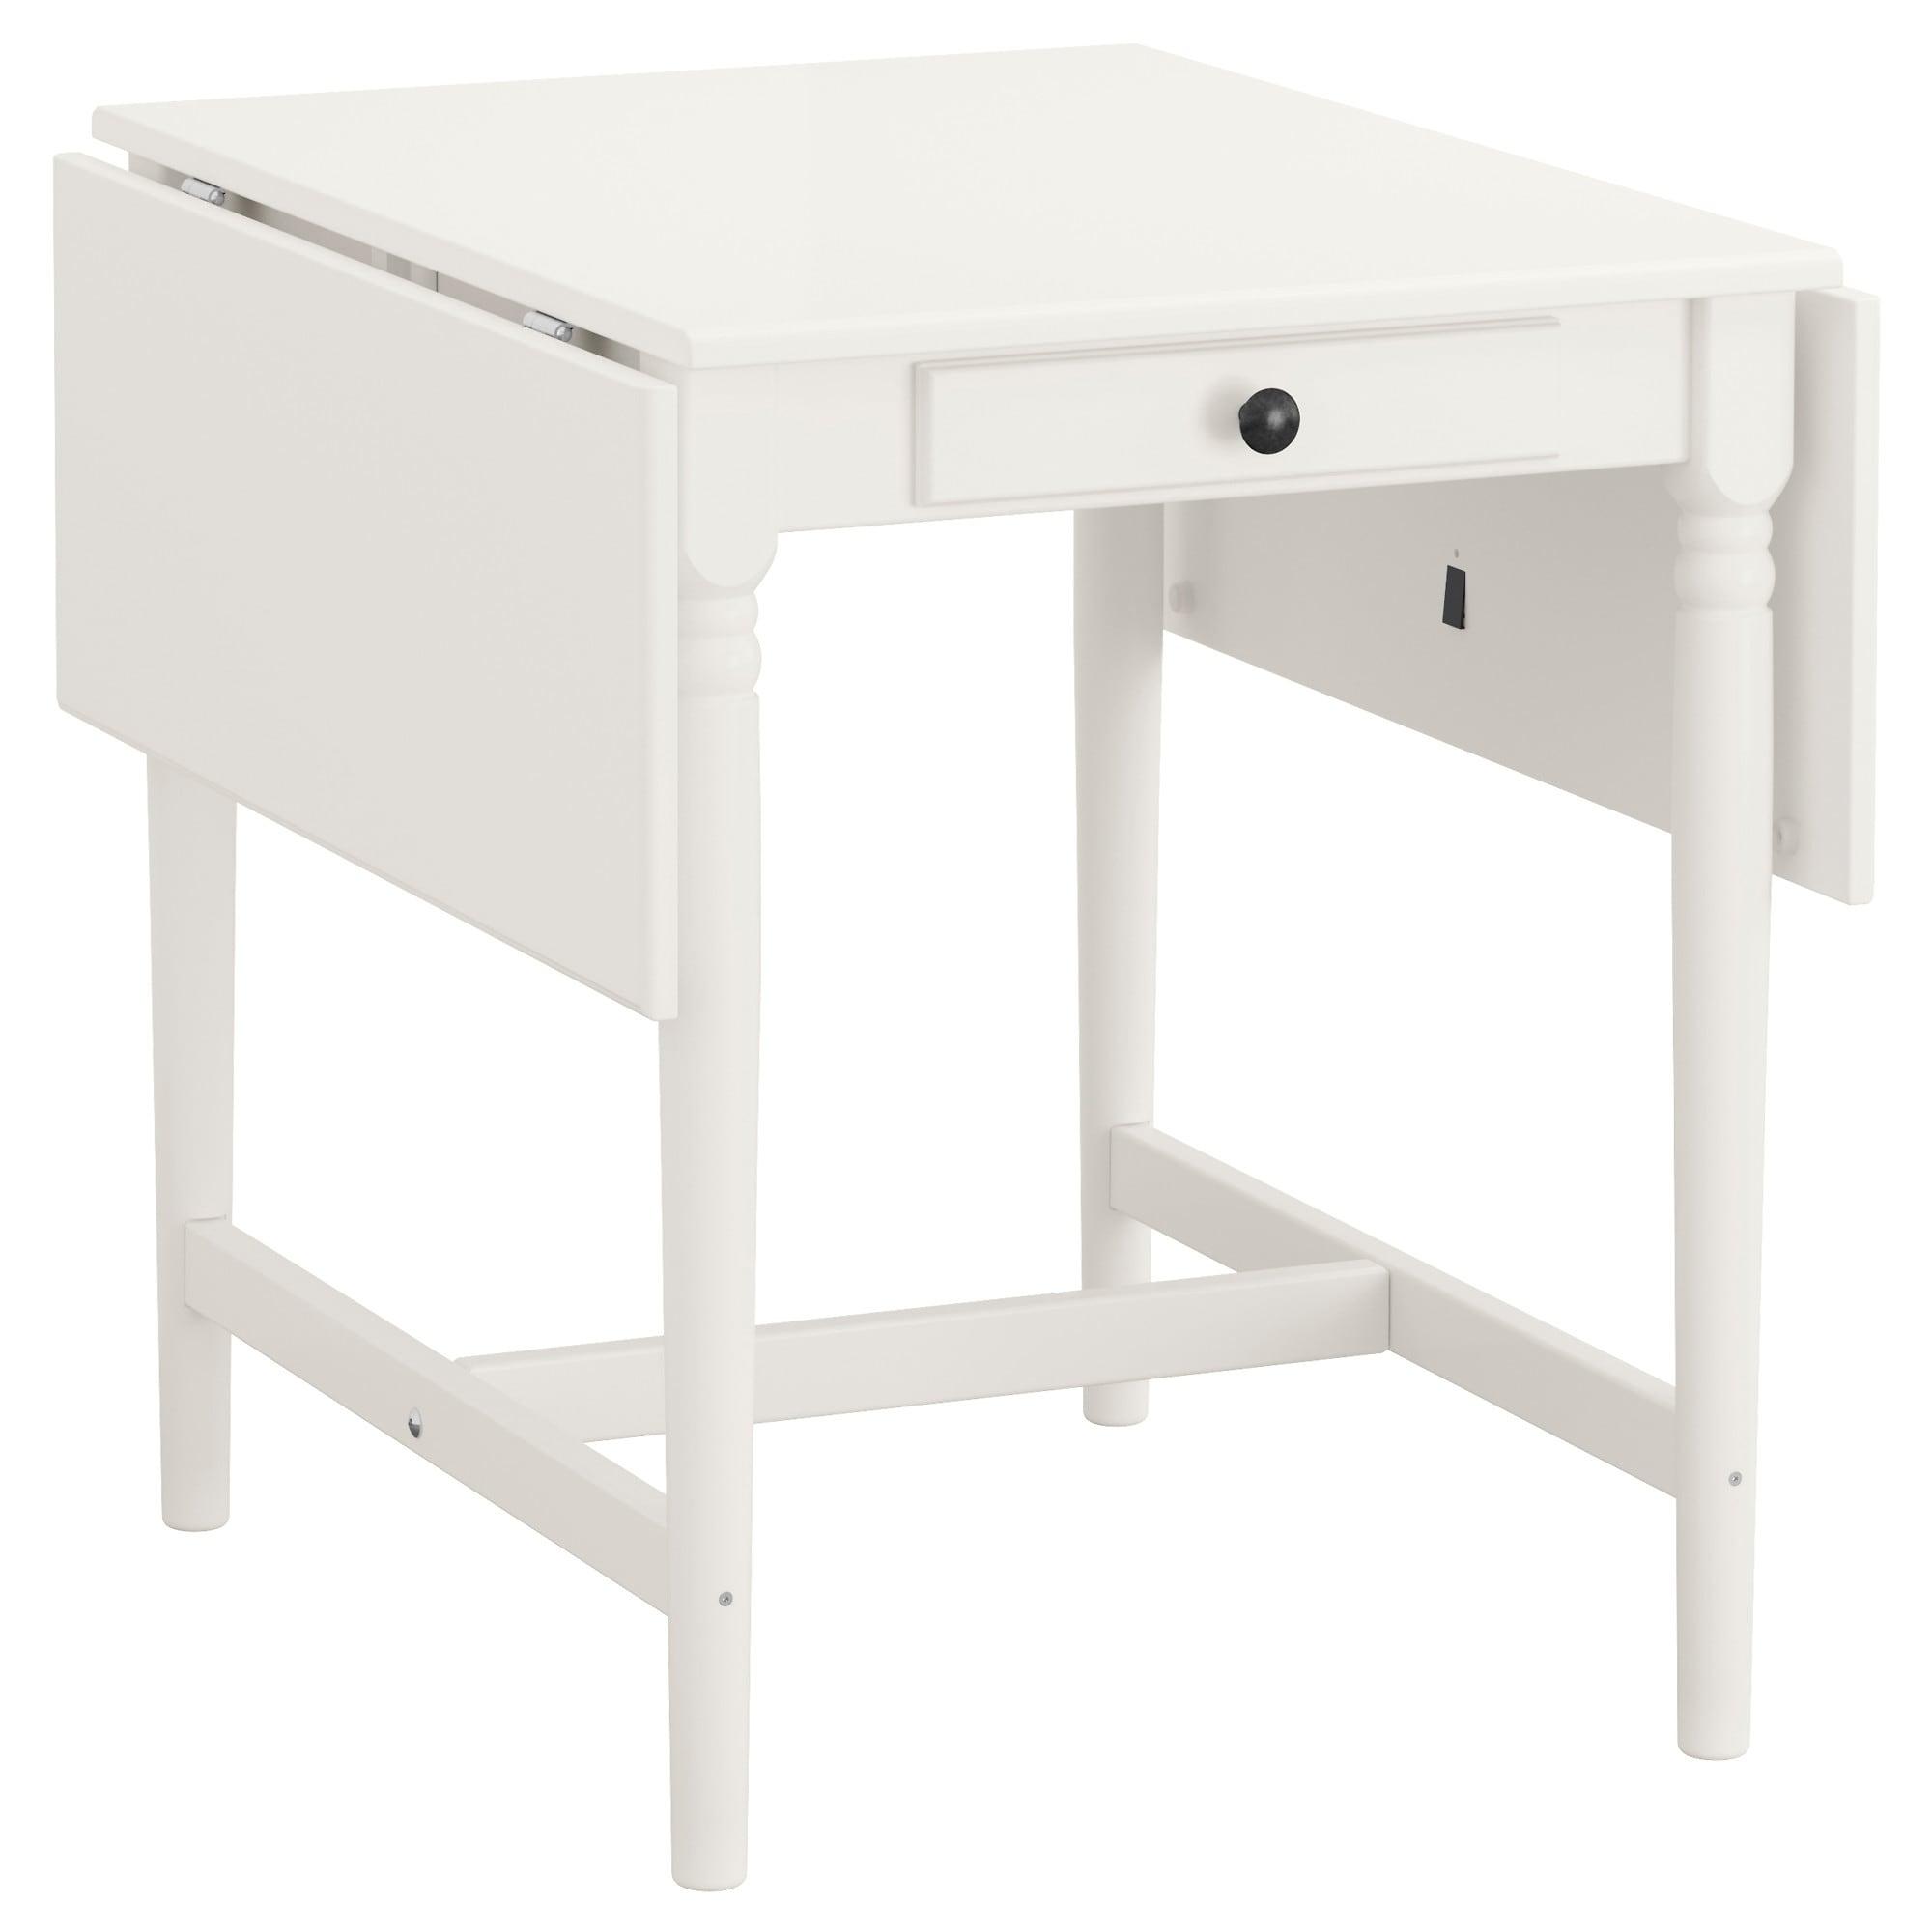 Mesa Redonda Blanca Ikea 3ldq Mesas Plegables Extensibles Pra Online Ikea